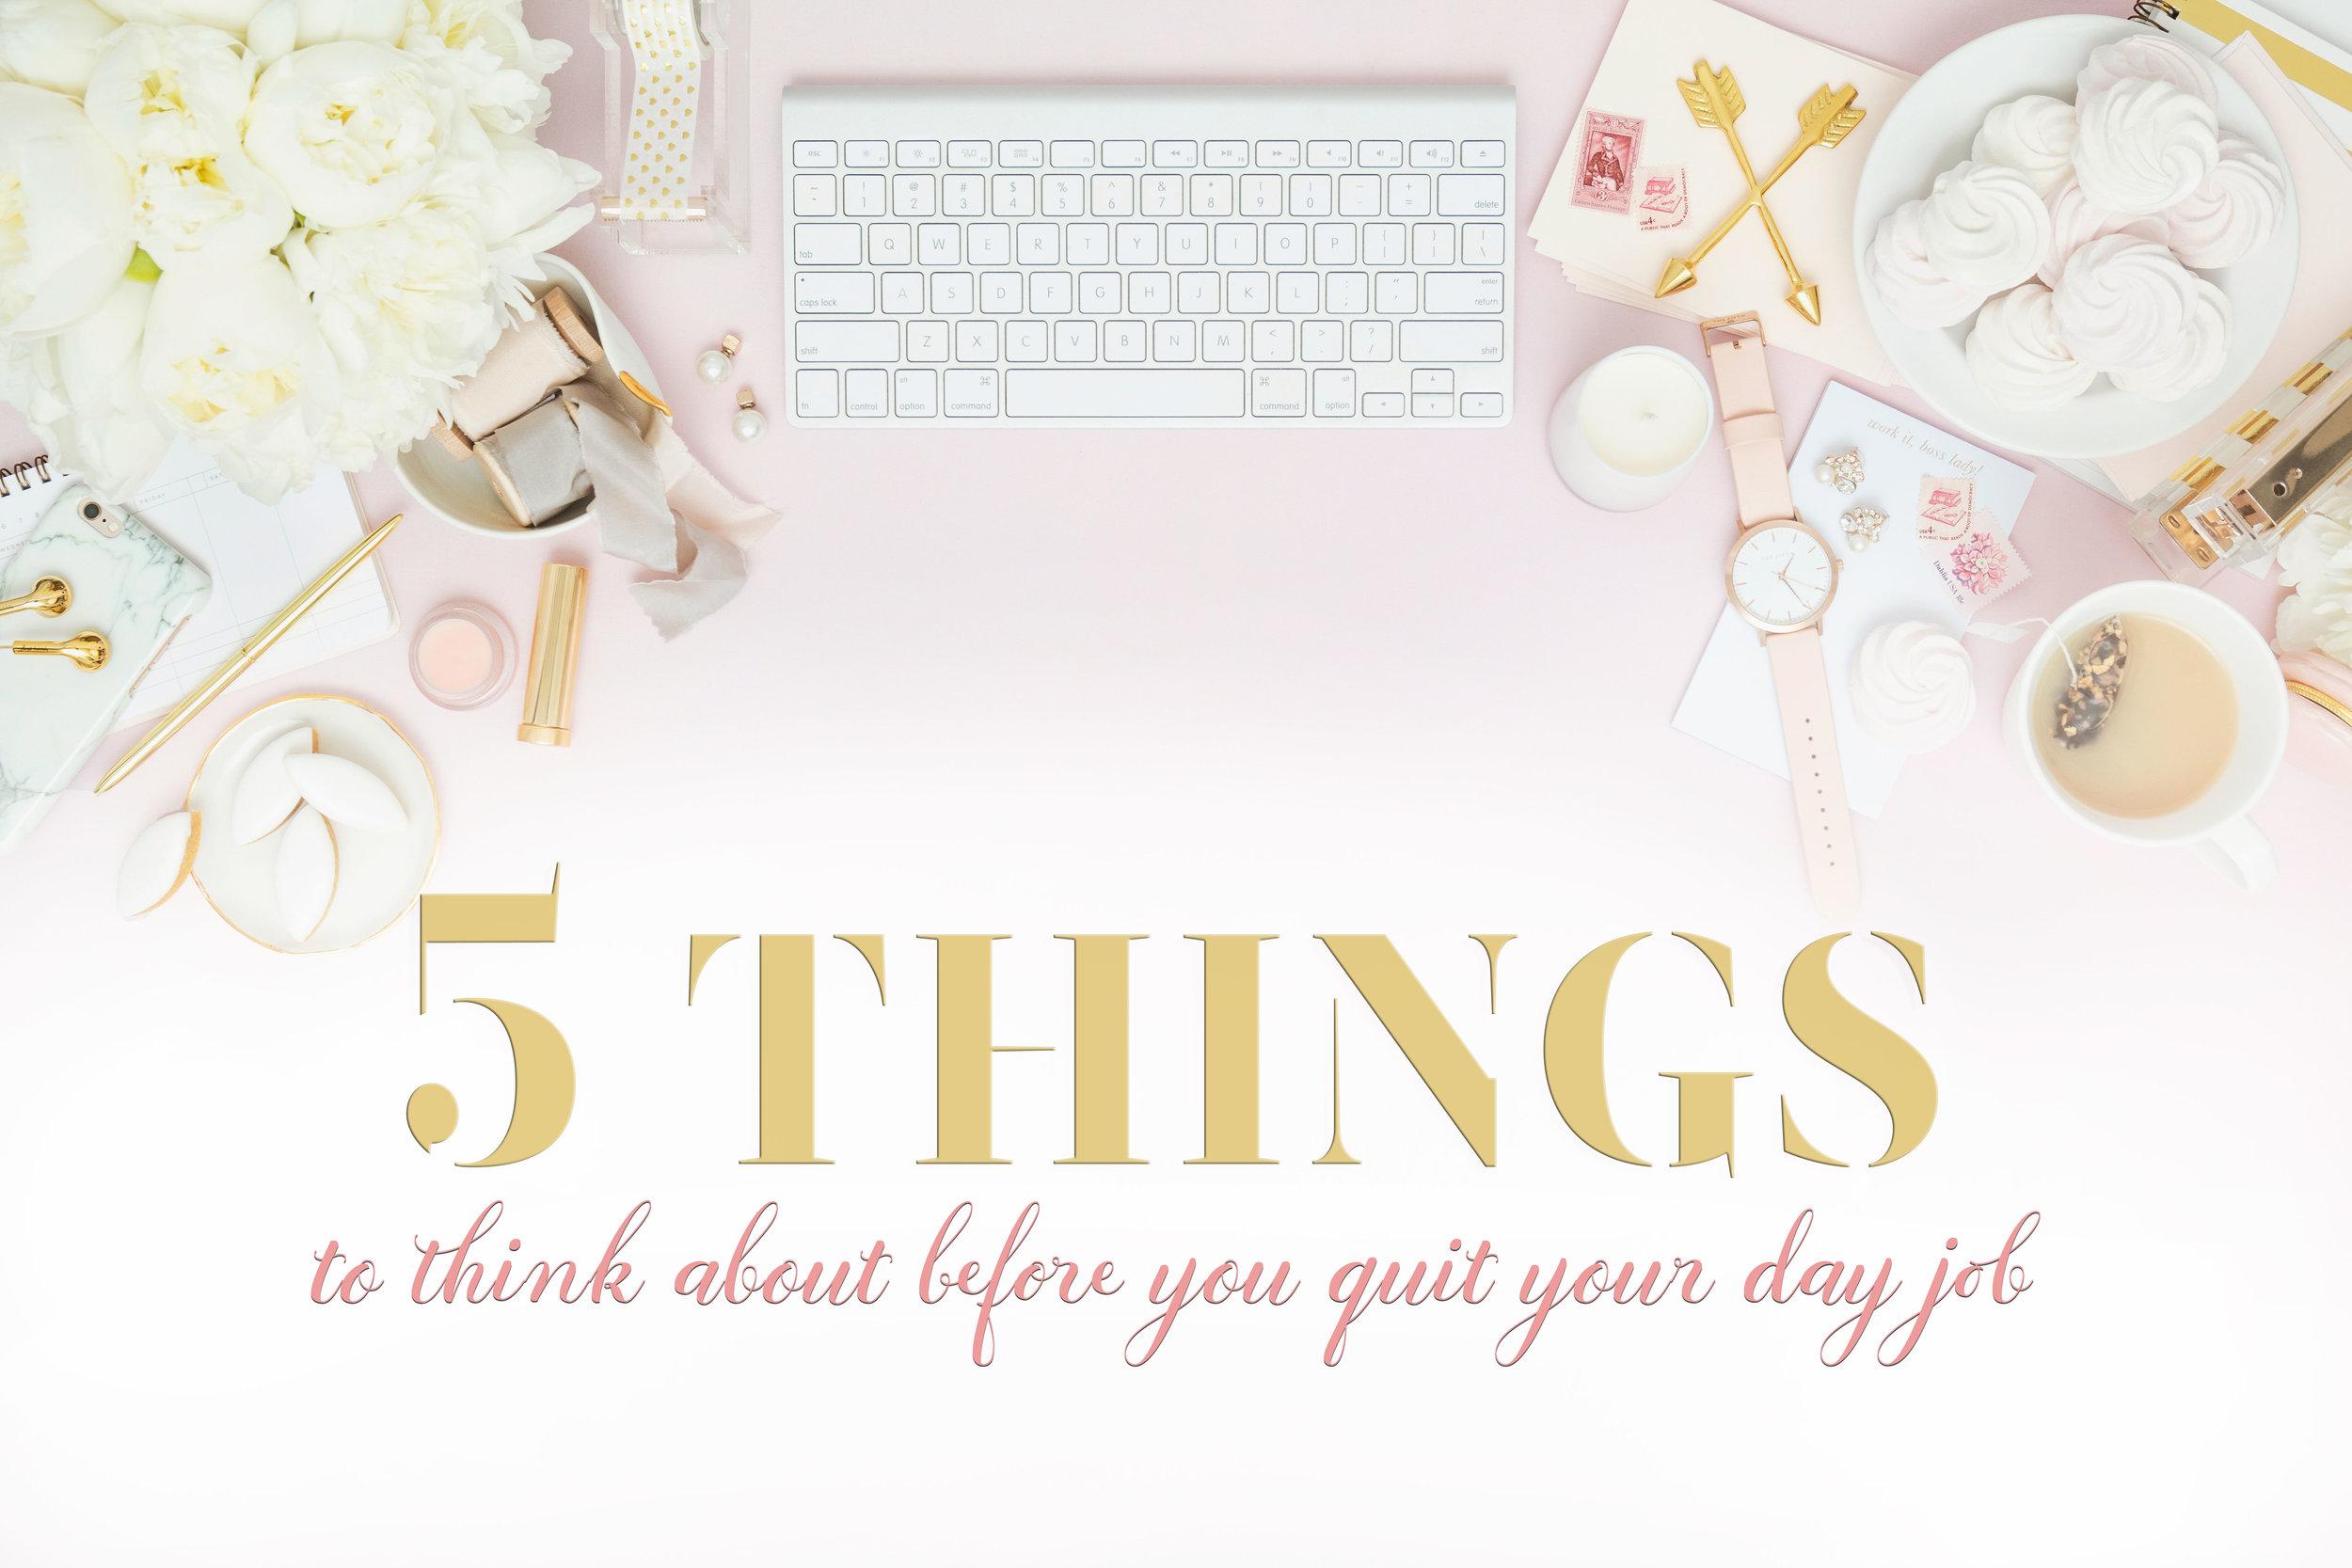 5-things-before-you-quit.jpg